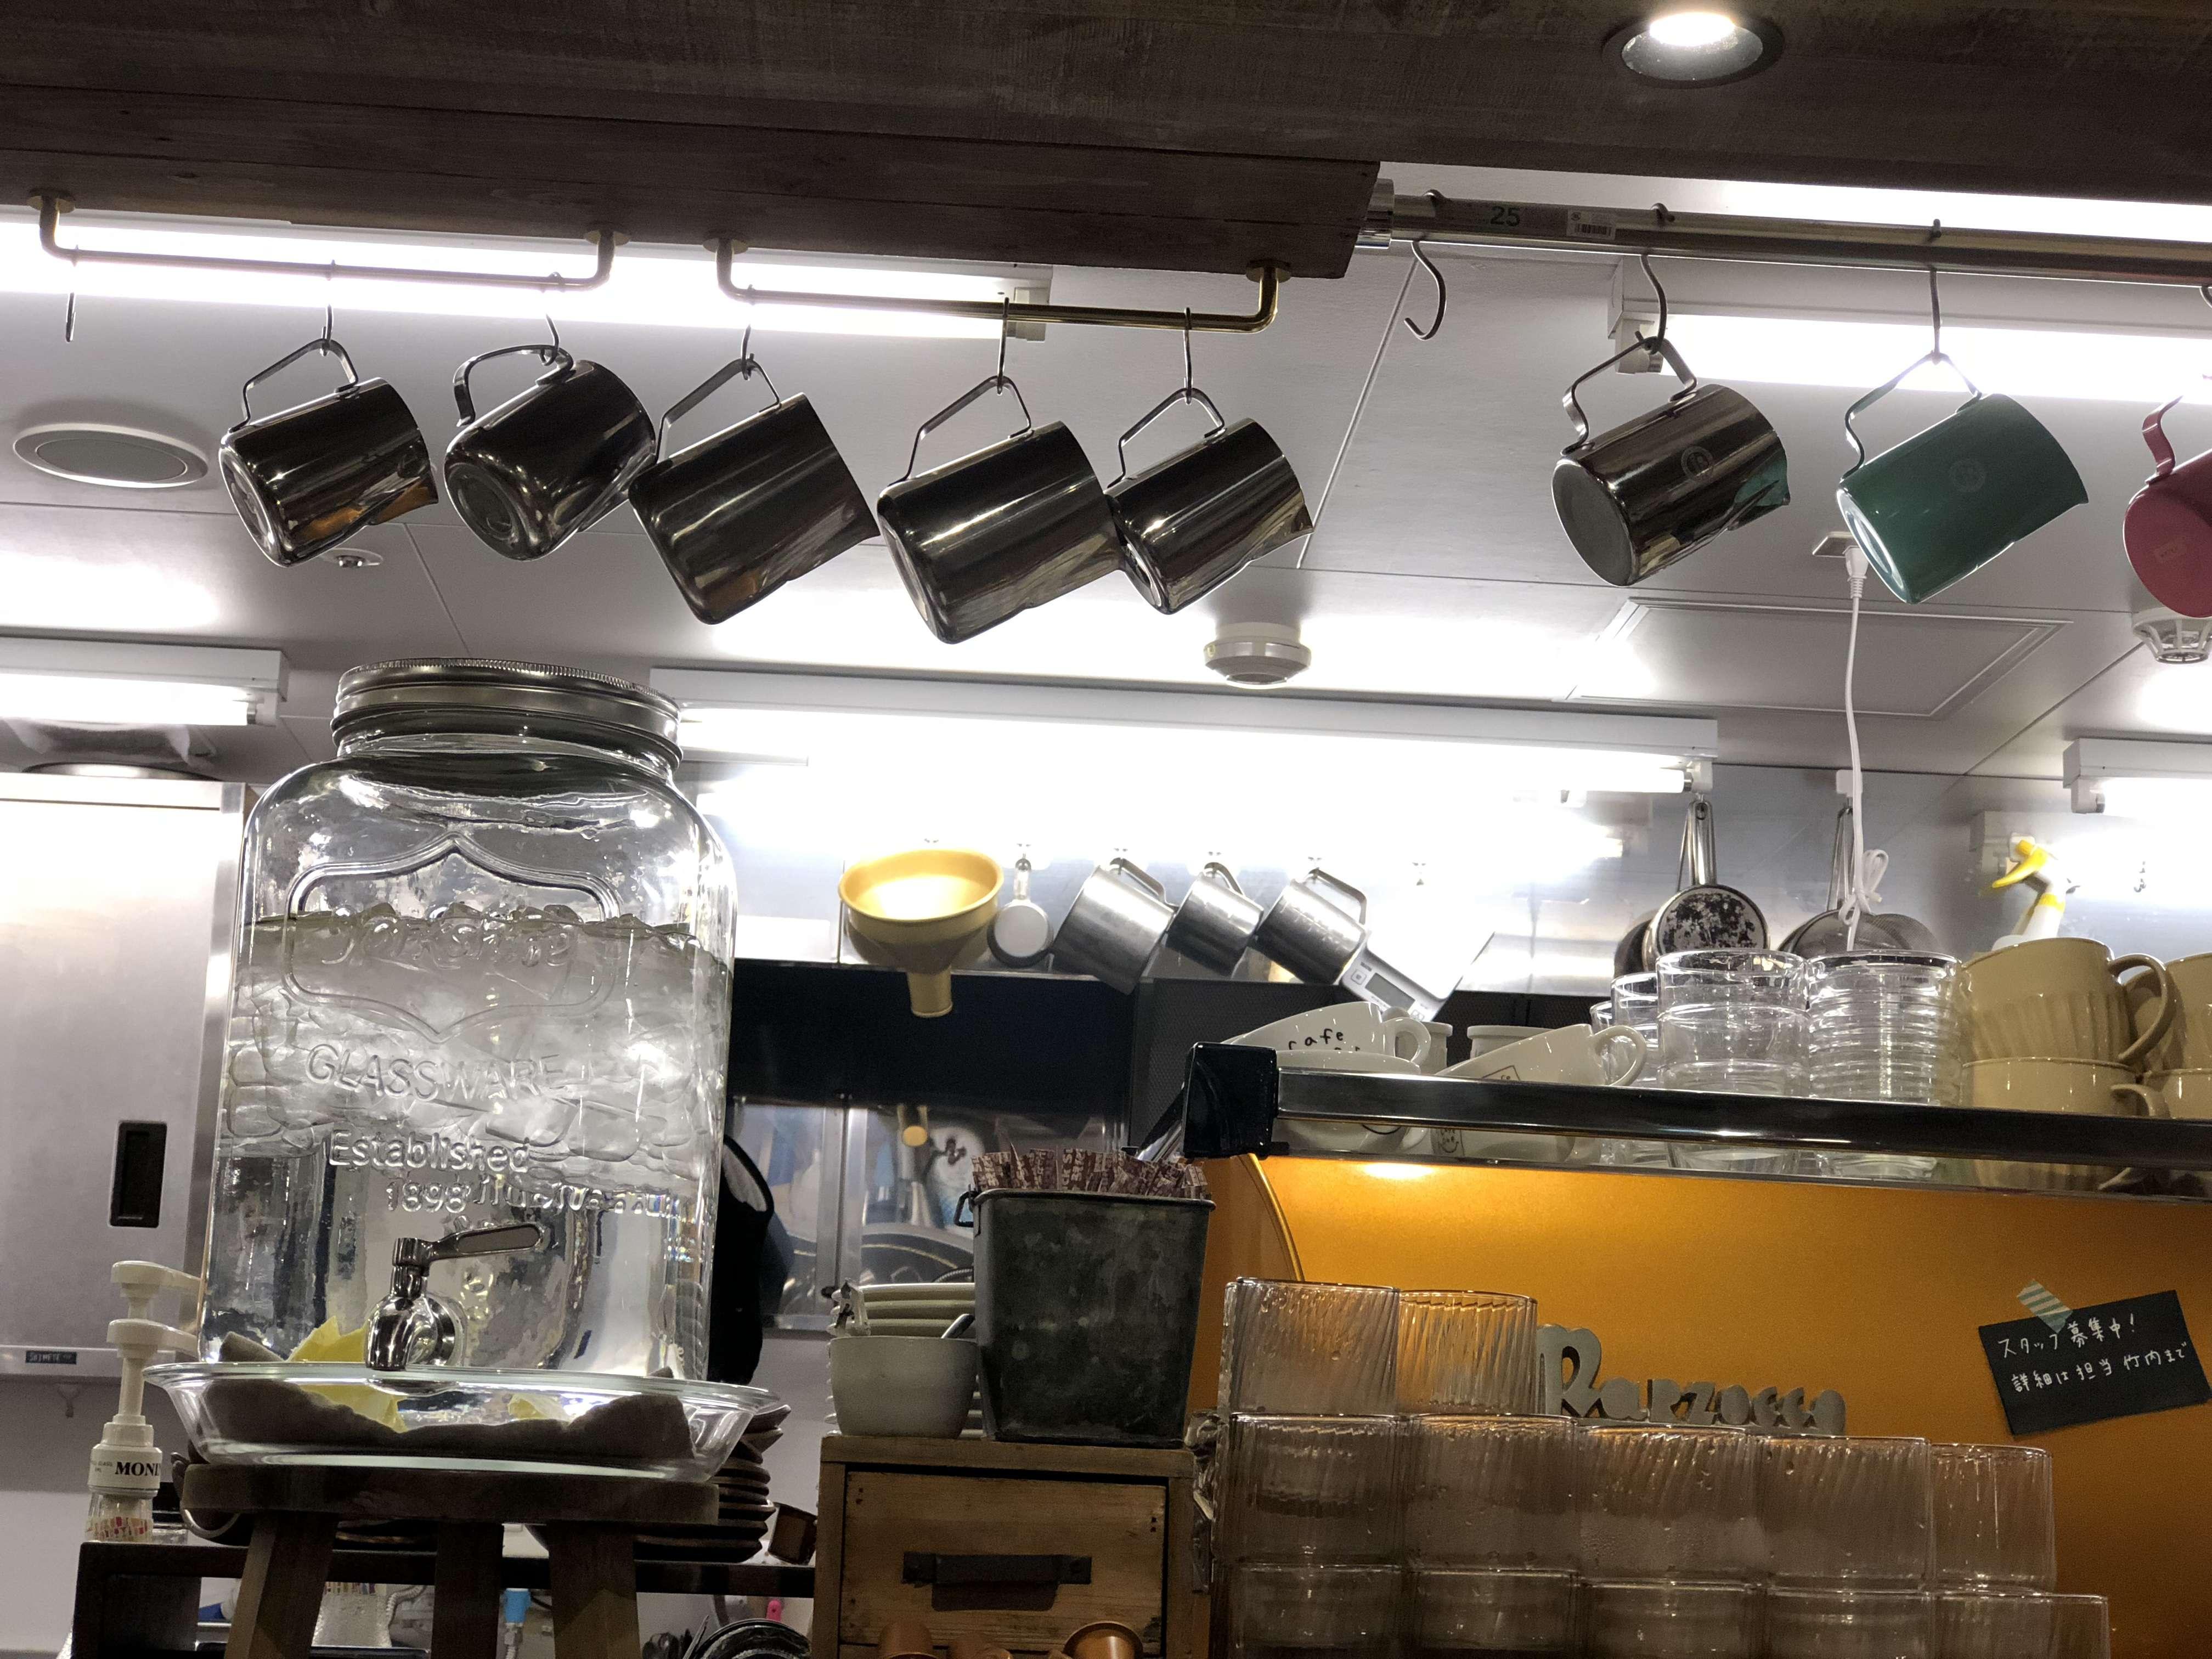 cafeone カフェワン 愛知県名古屋市丸の内 ラテアート ランチ おしゃれ おすすめ